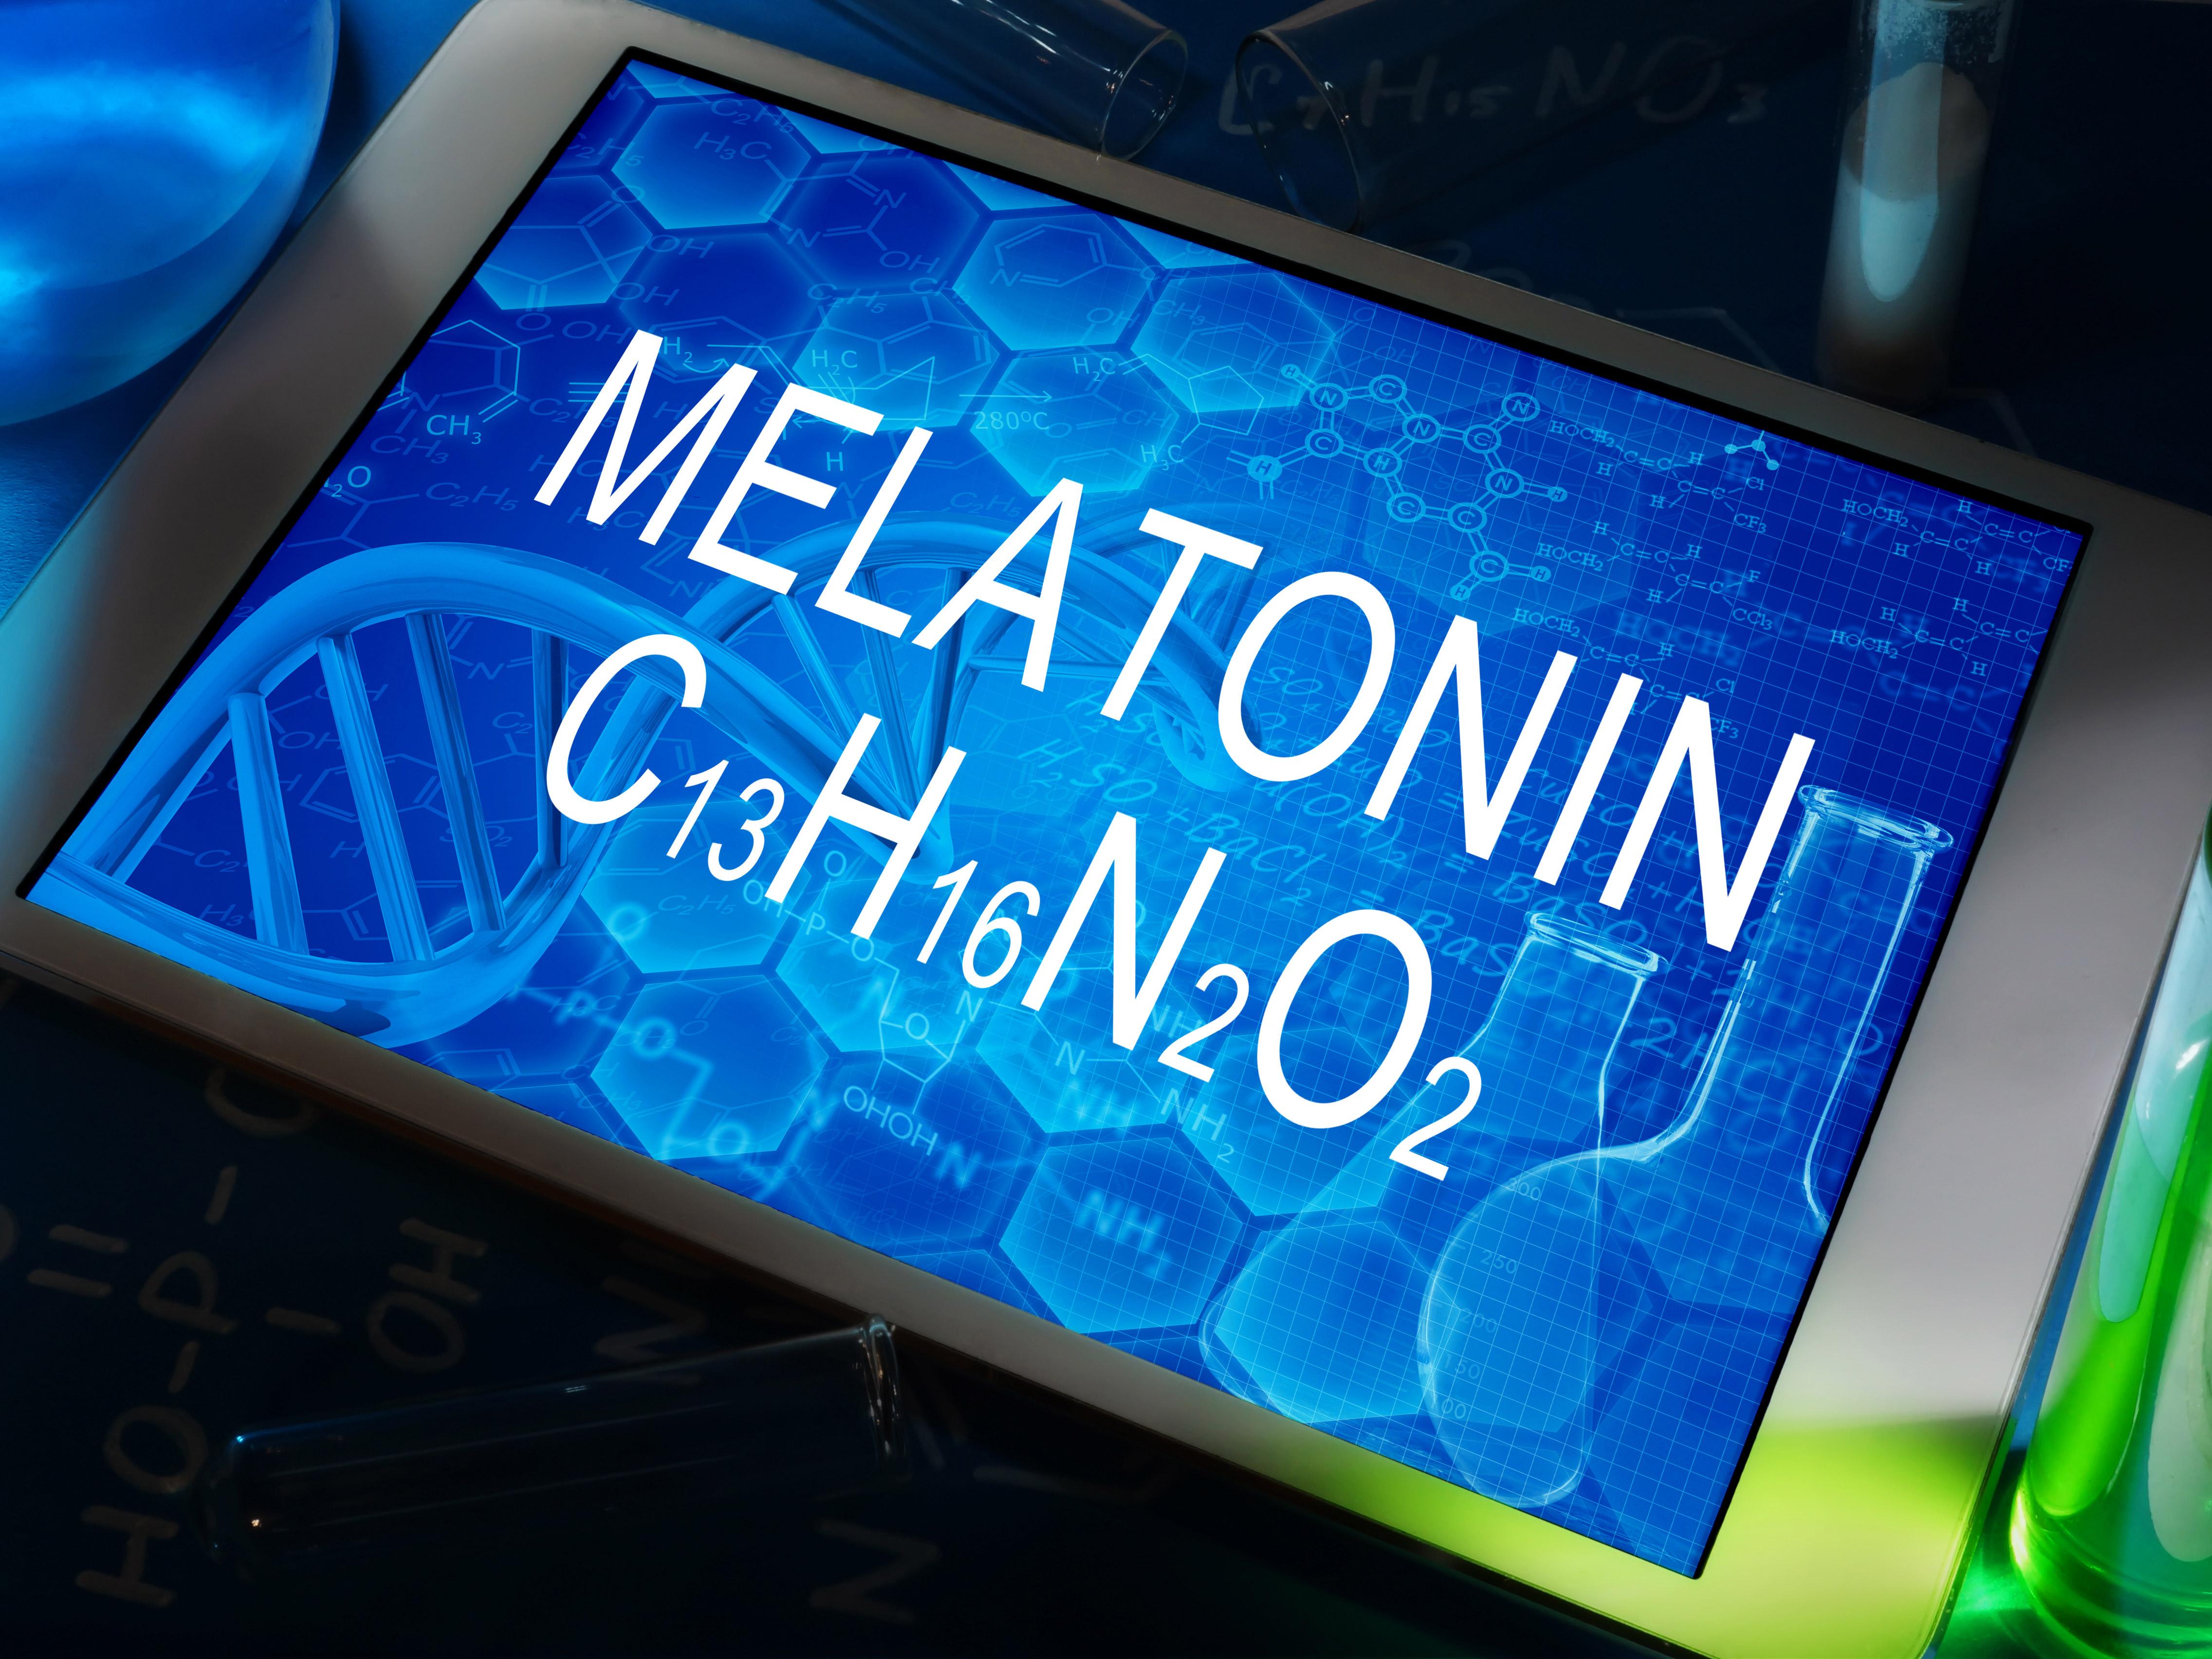 Marvelous melatonin helps you sleep, age slower, and avoid disease